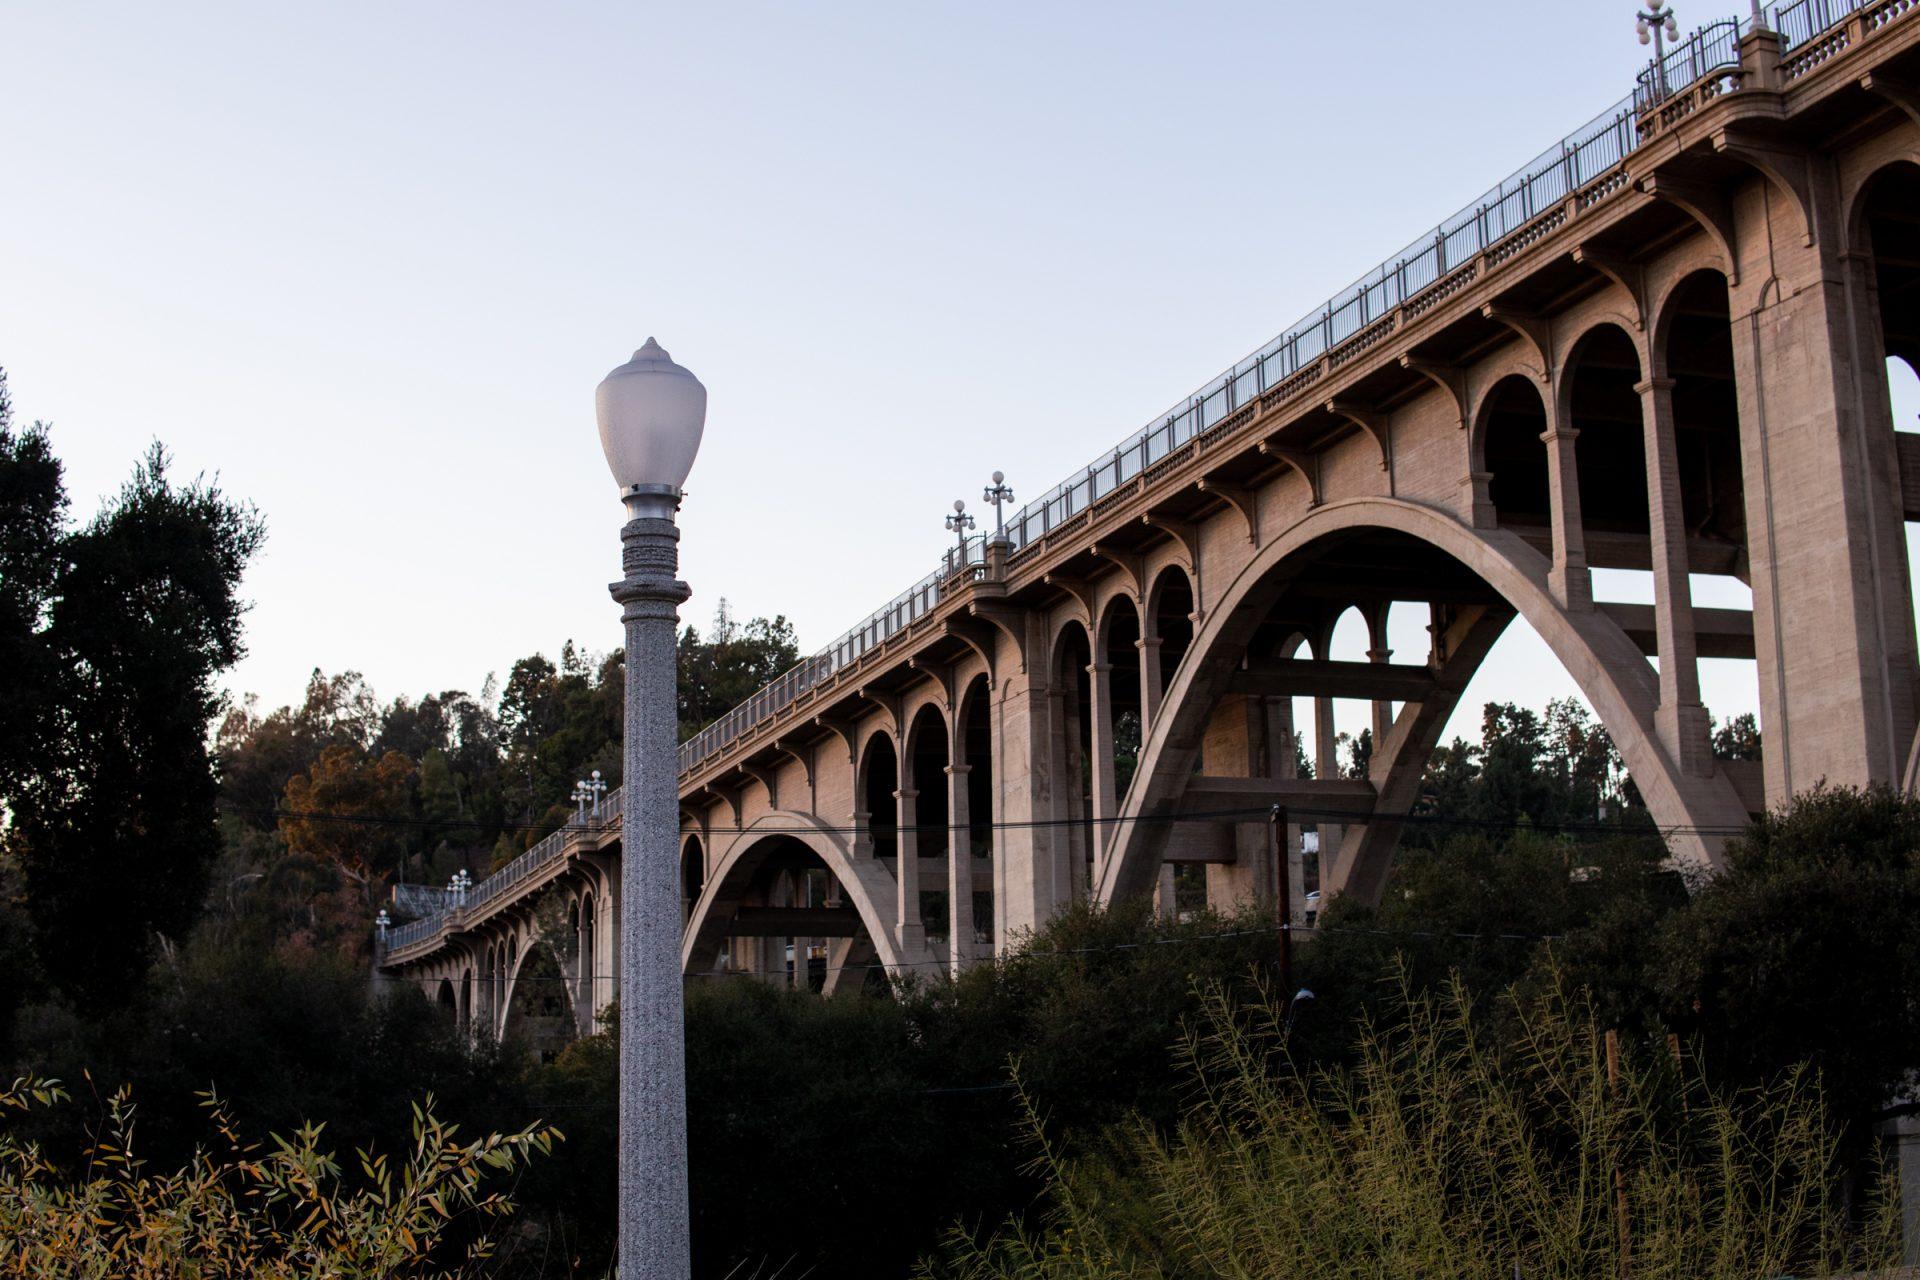 Arch Bridge Beyond Streetlight And Plants